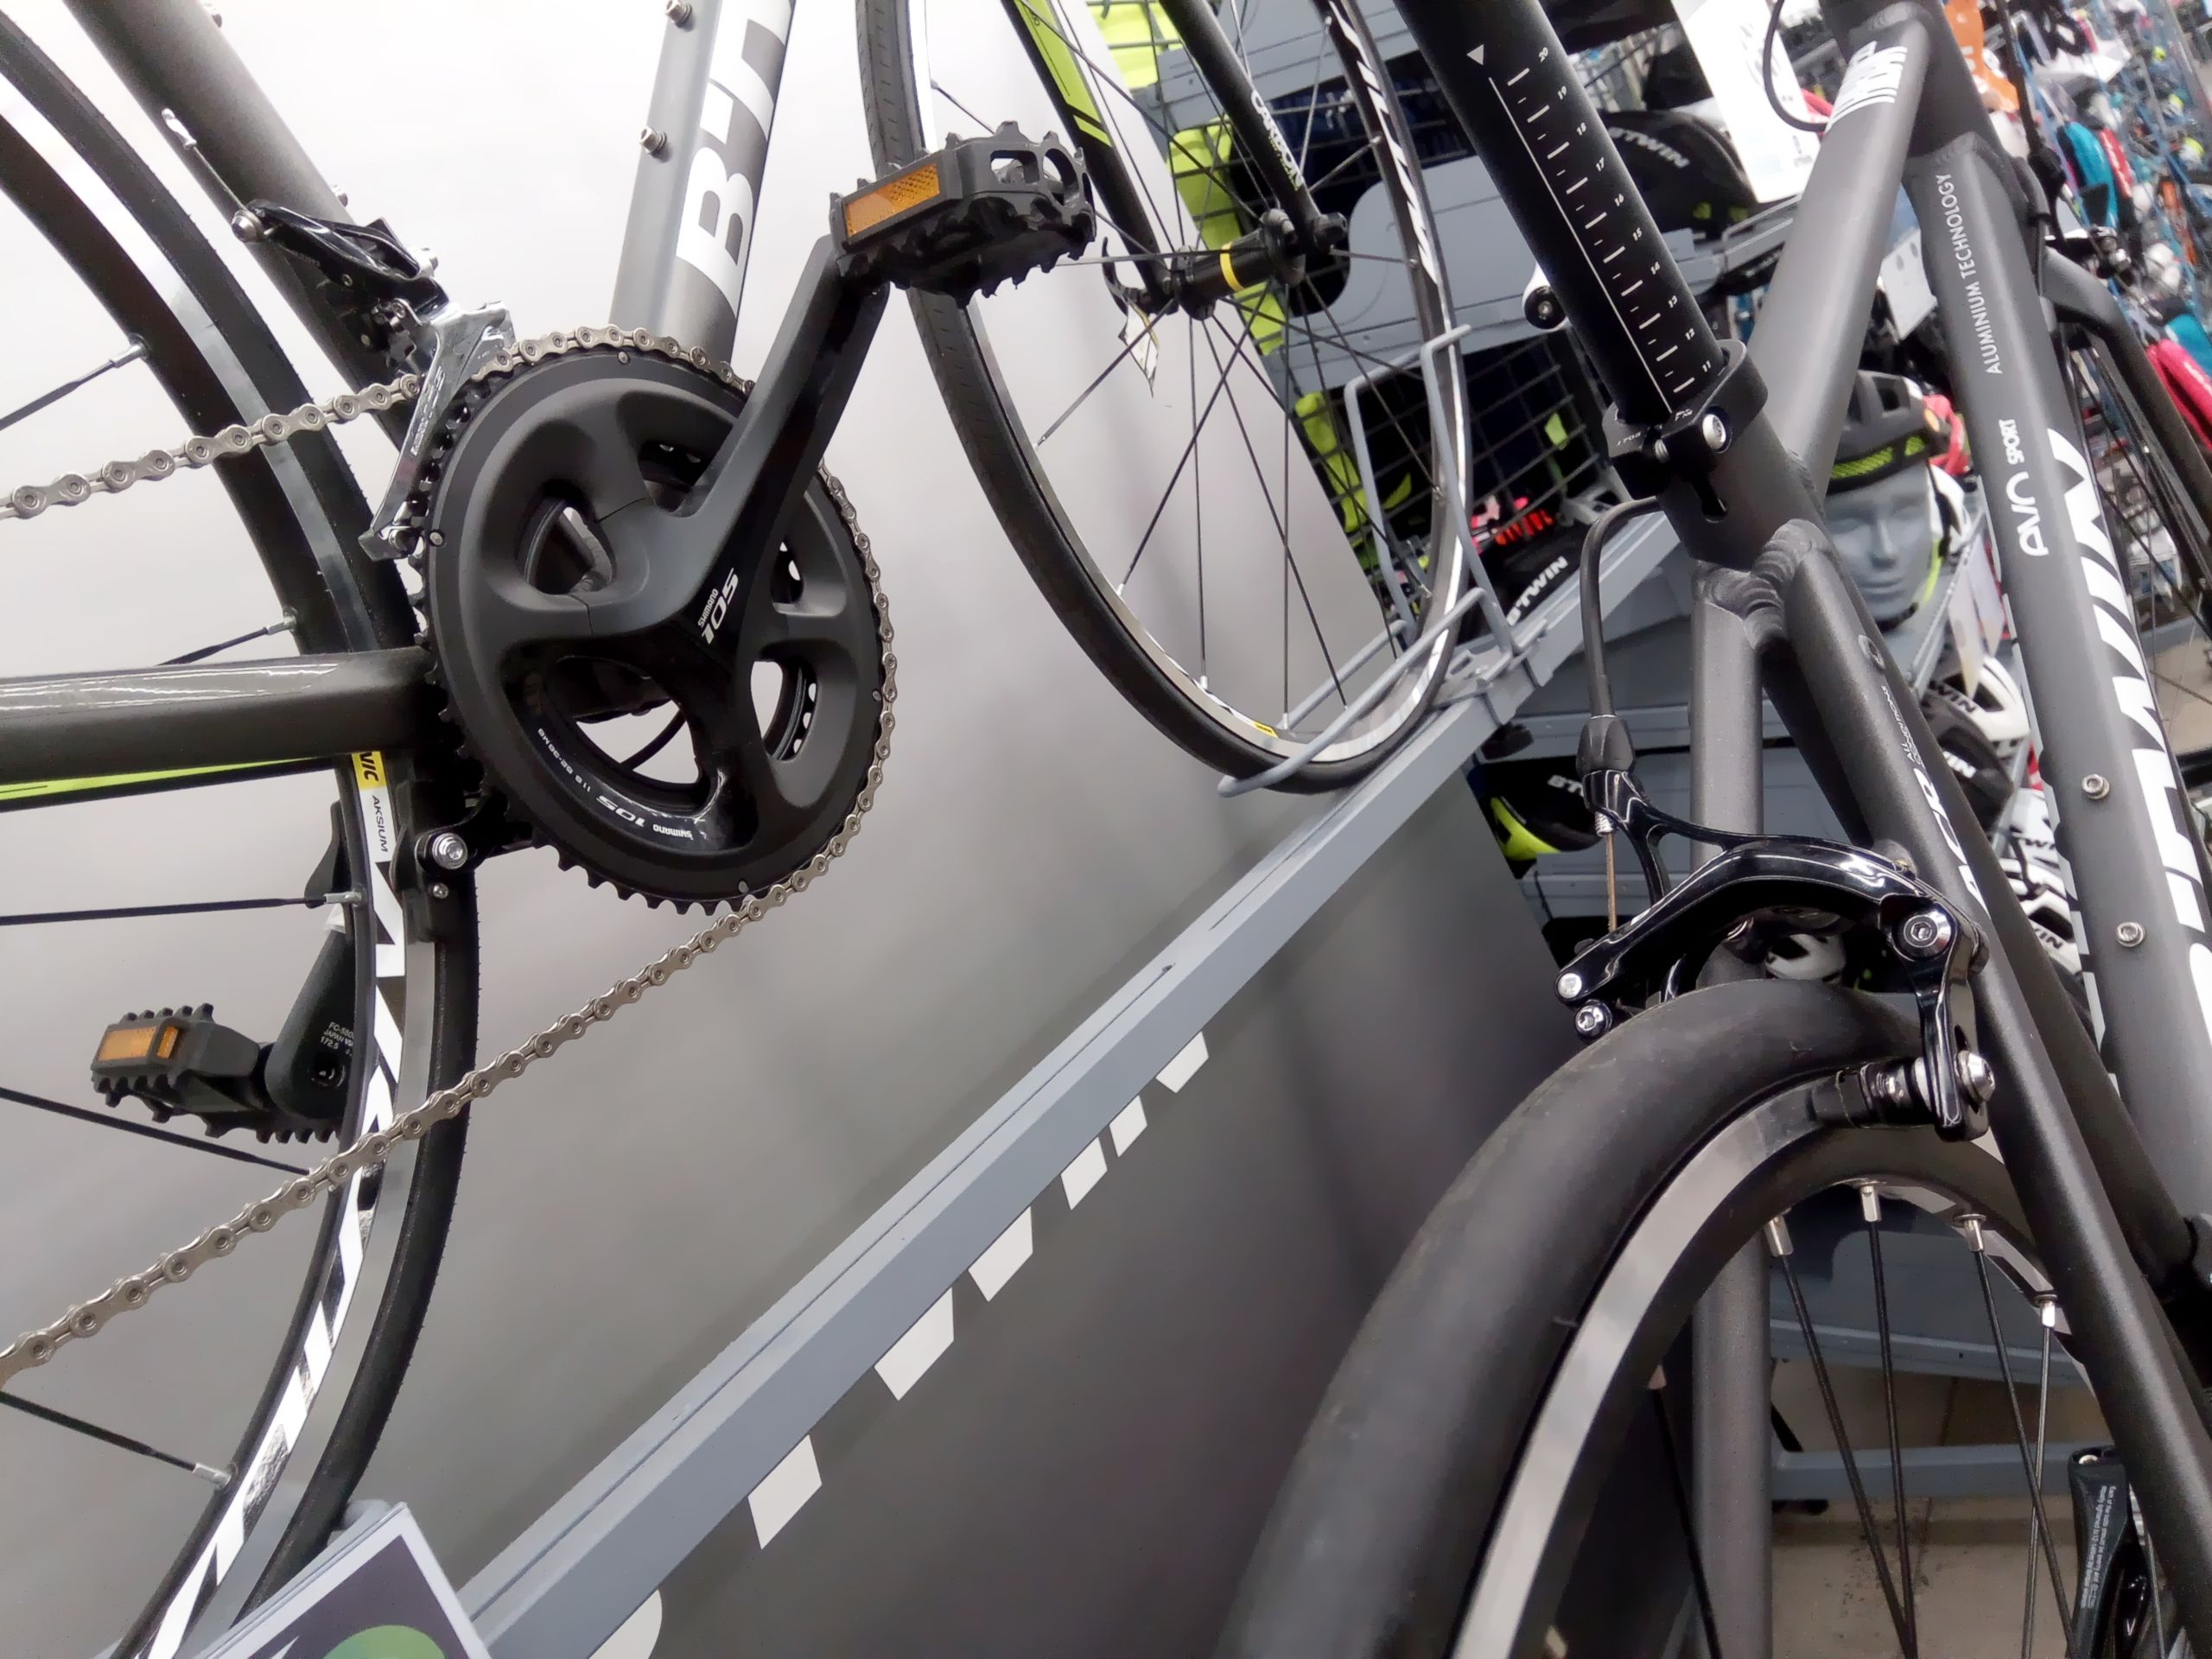 File:Posizione freni bici.jpg - Wikipedia